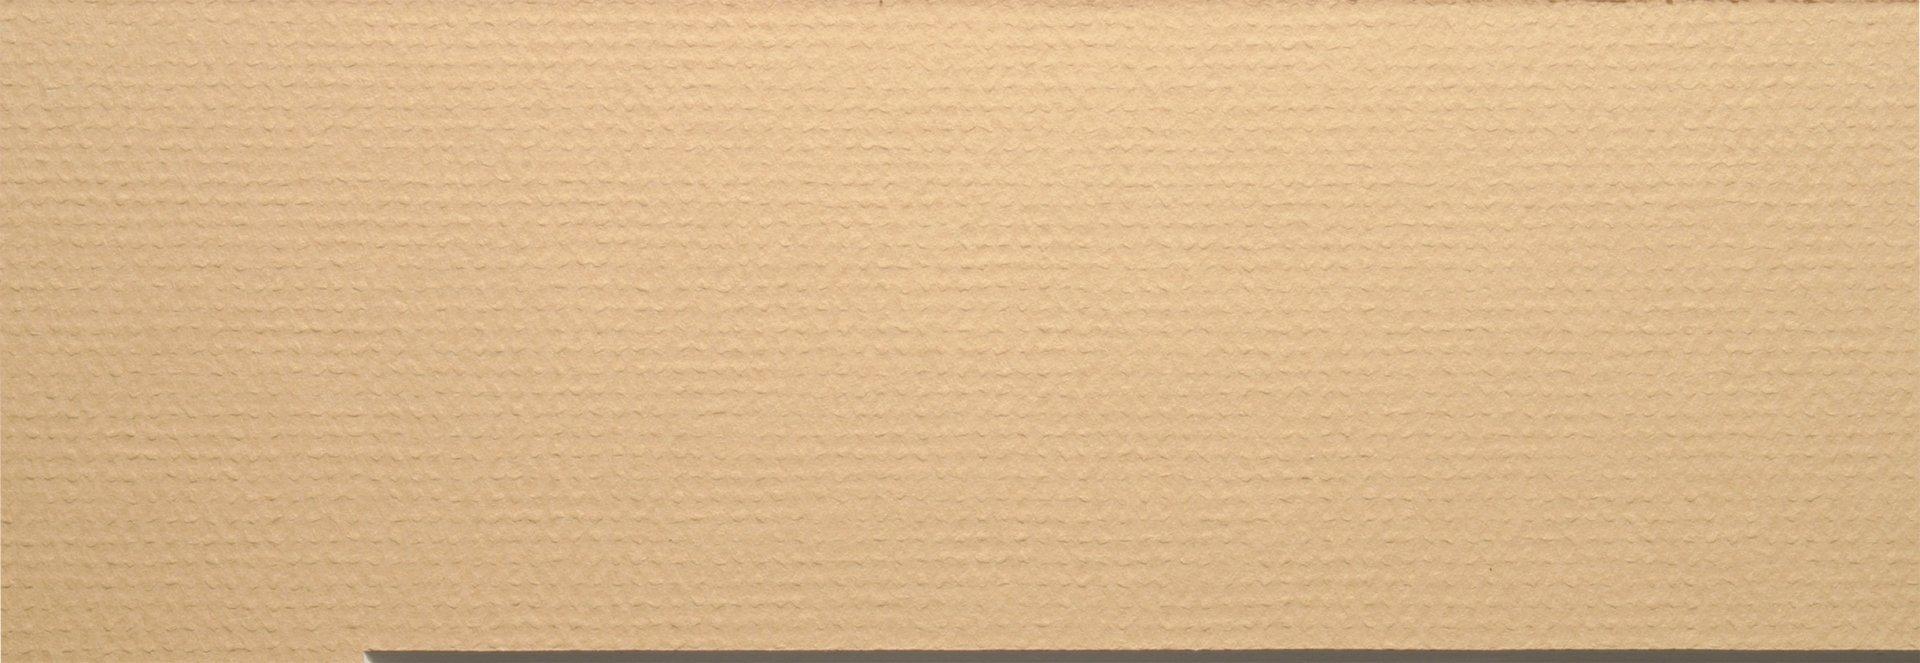 SRM1061 Sandstone